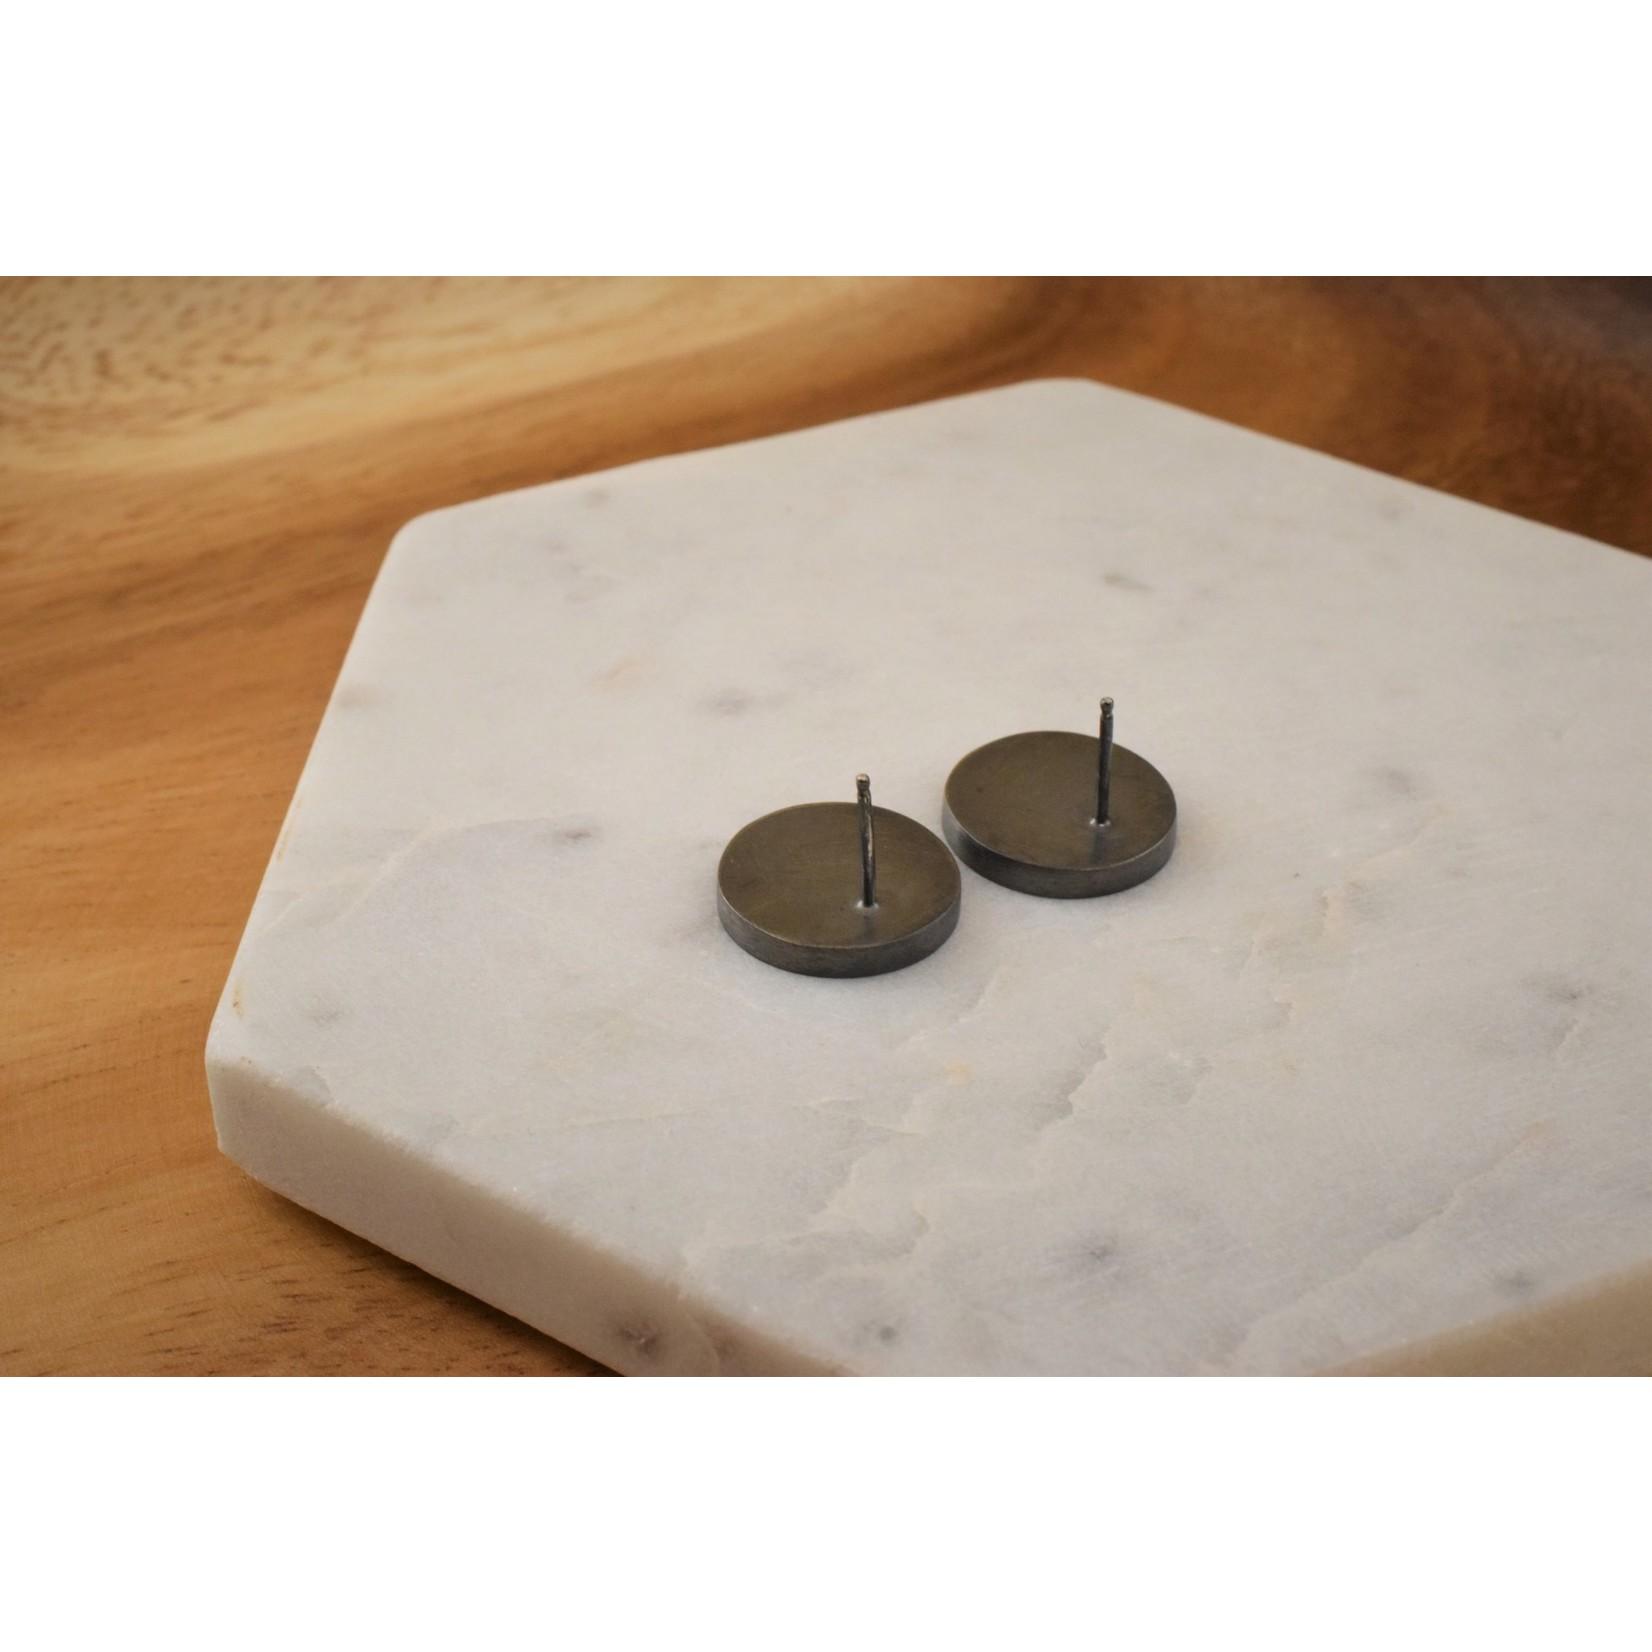 Hartley Studio Orbit Post Earrings